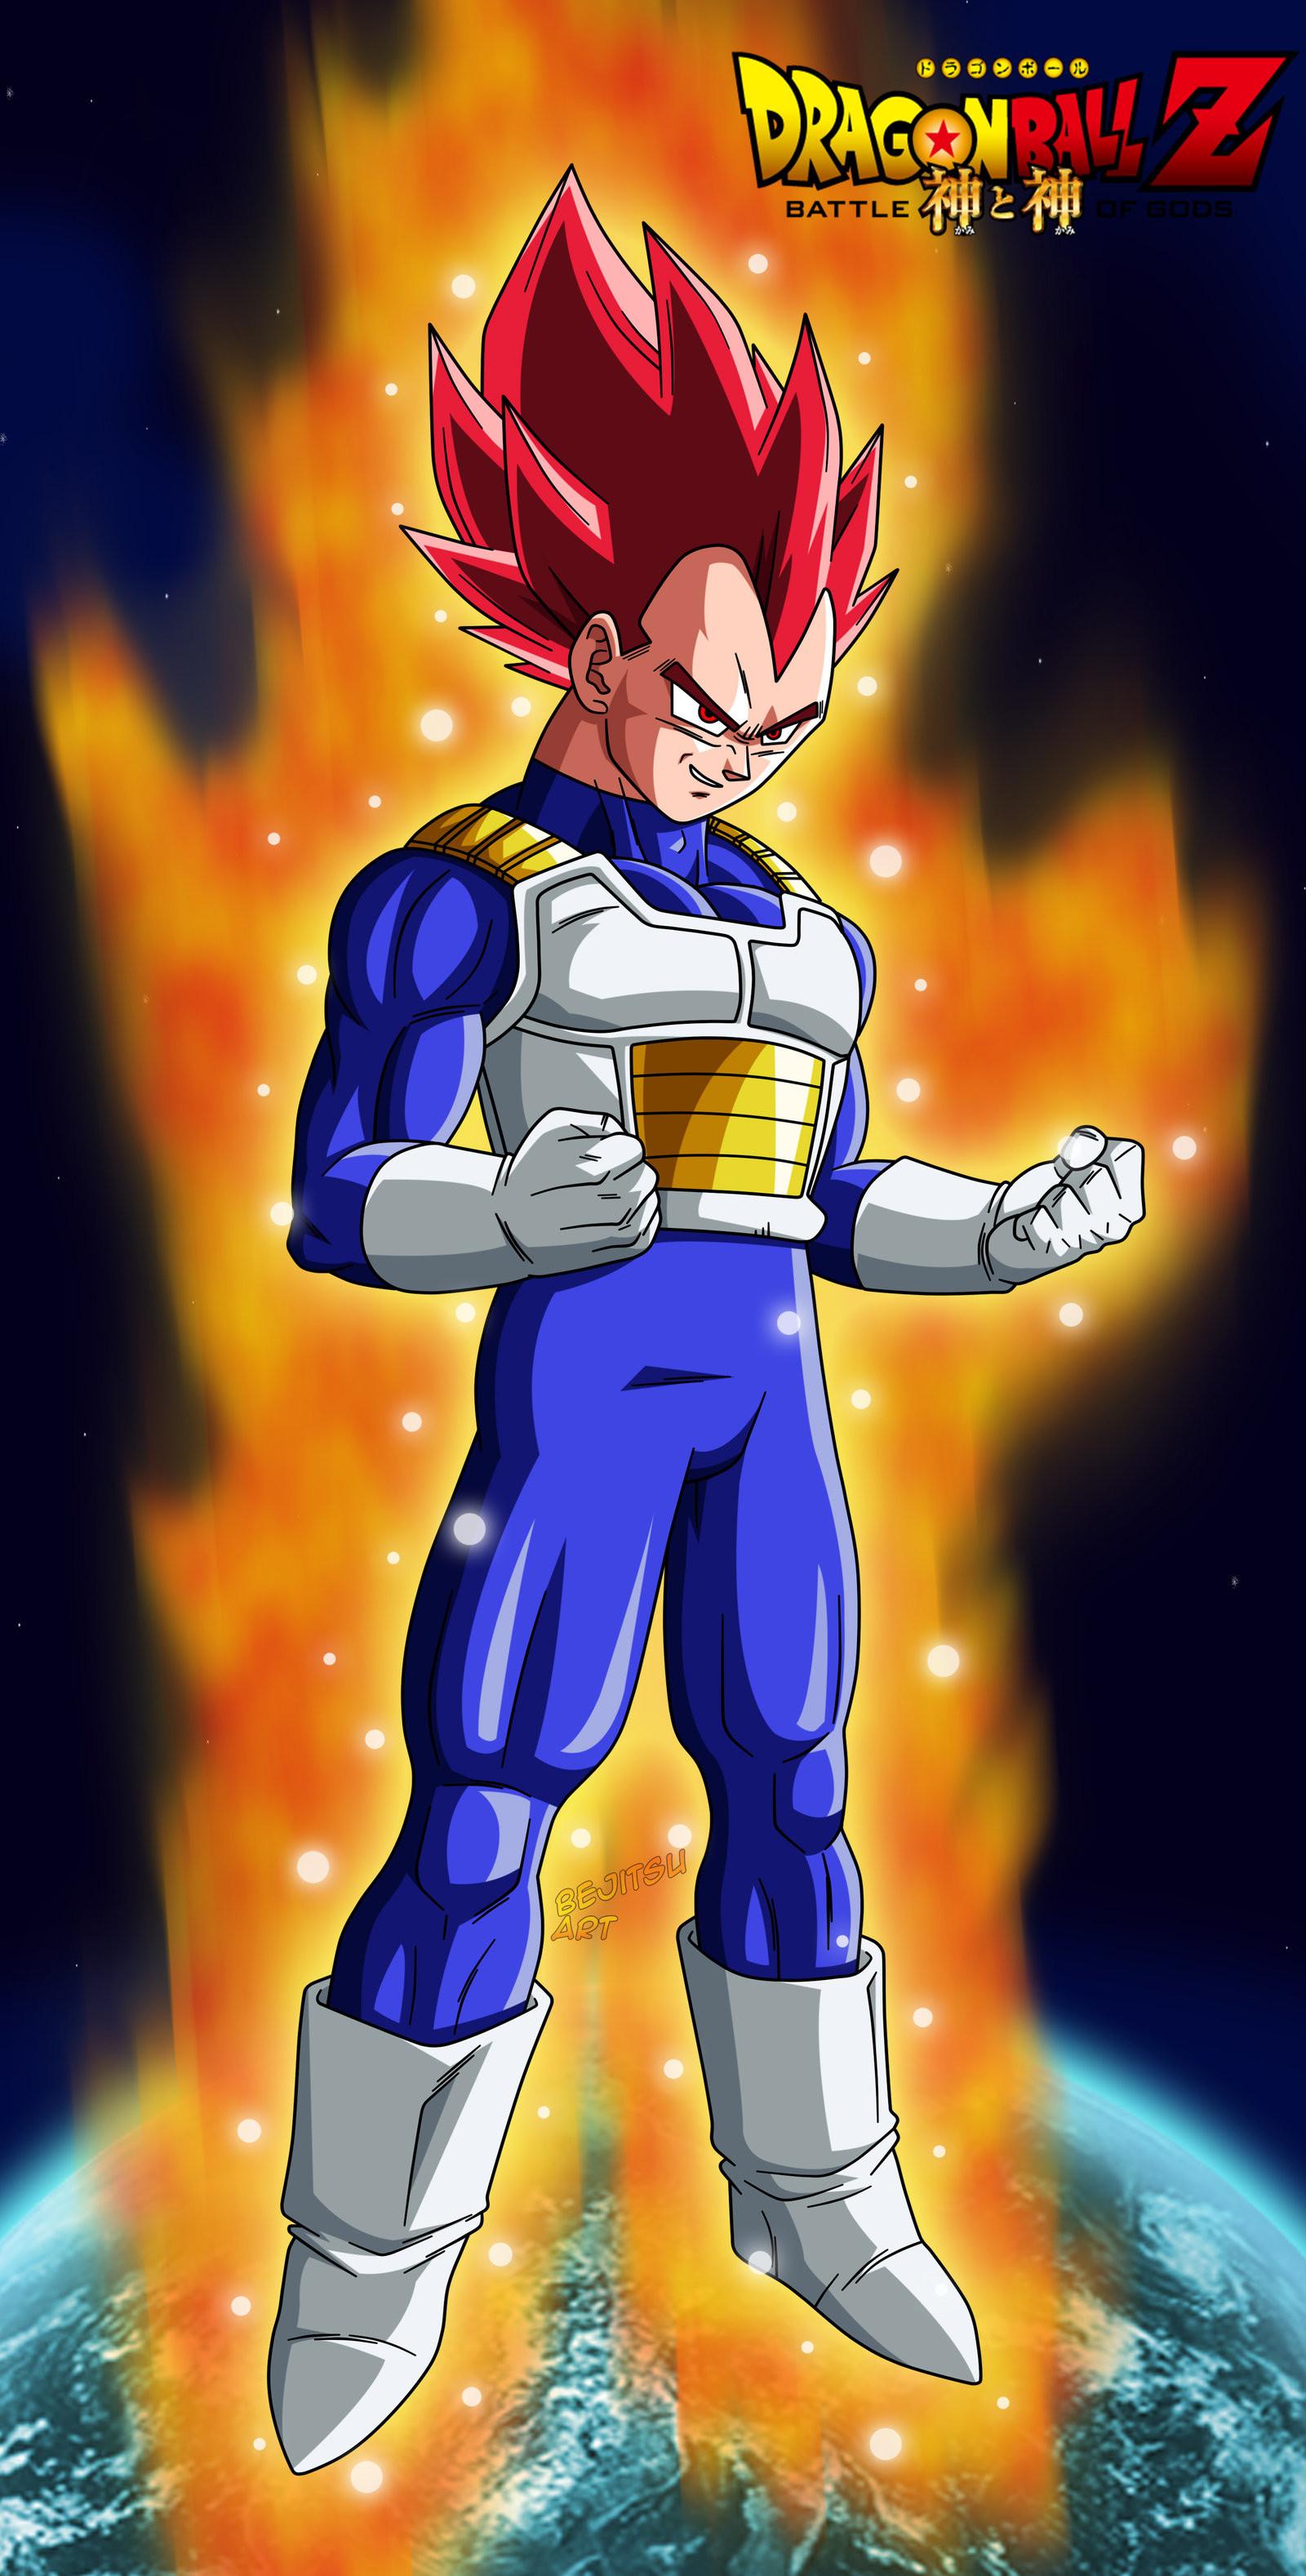 Dragon Ball Z Vegeta Super Saiyan God